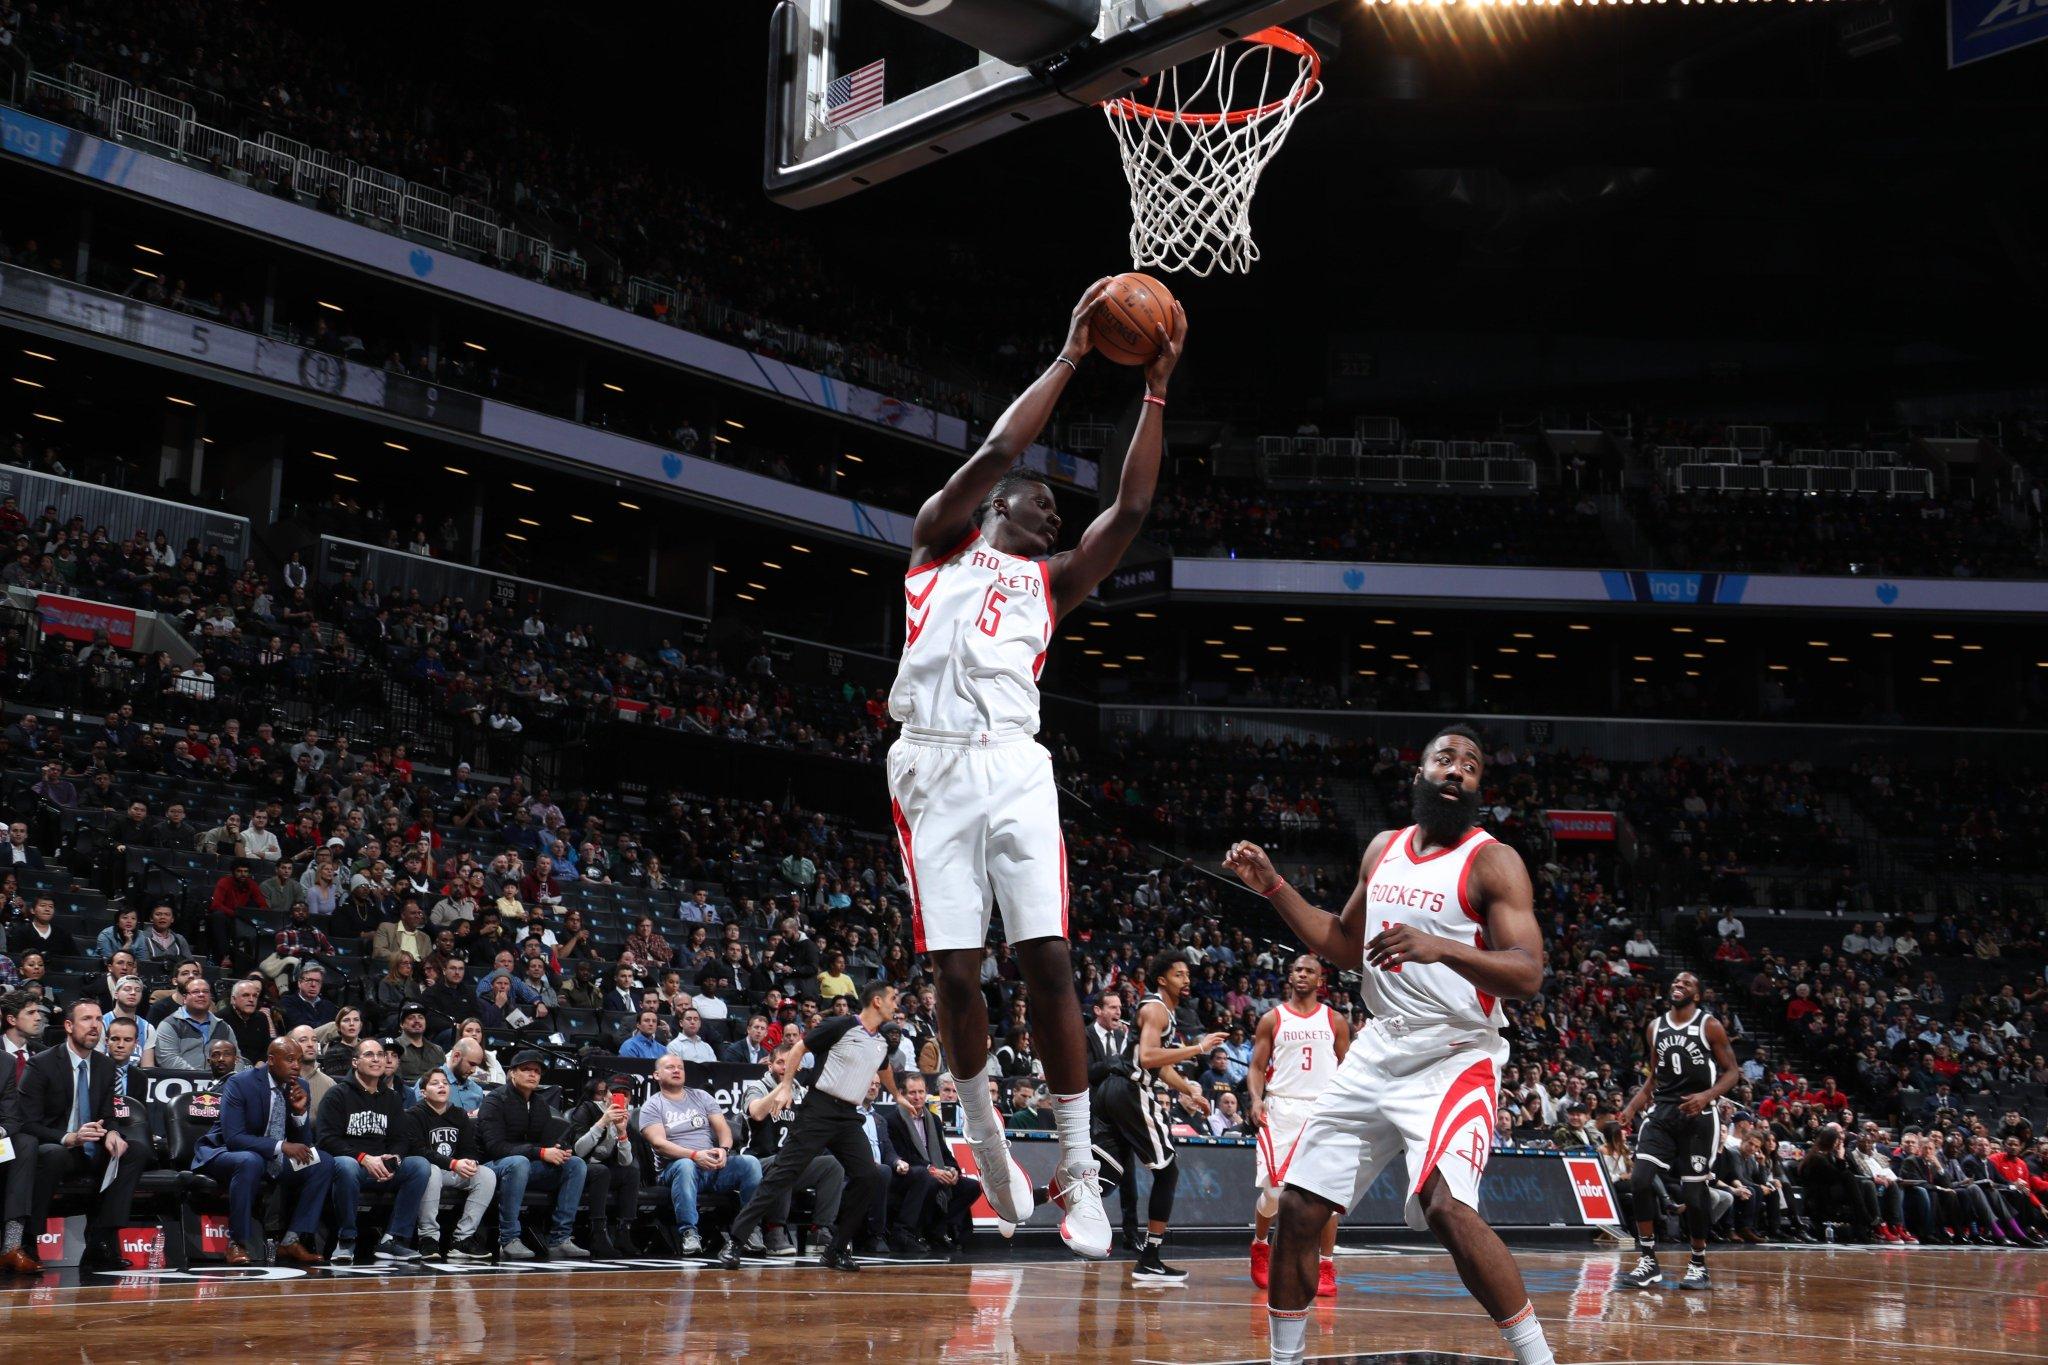 Solid first quarter. ��  #Rockets 38 l Nets 31   �� Capela 10PTS/5REB �� Green 8PTS https://t.co/z2lYhK2bU8